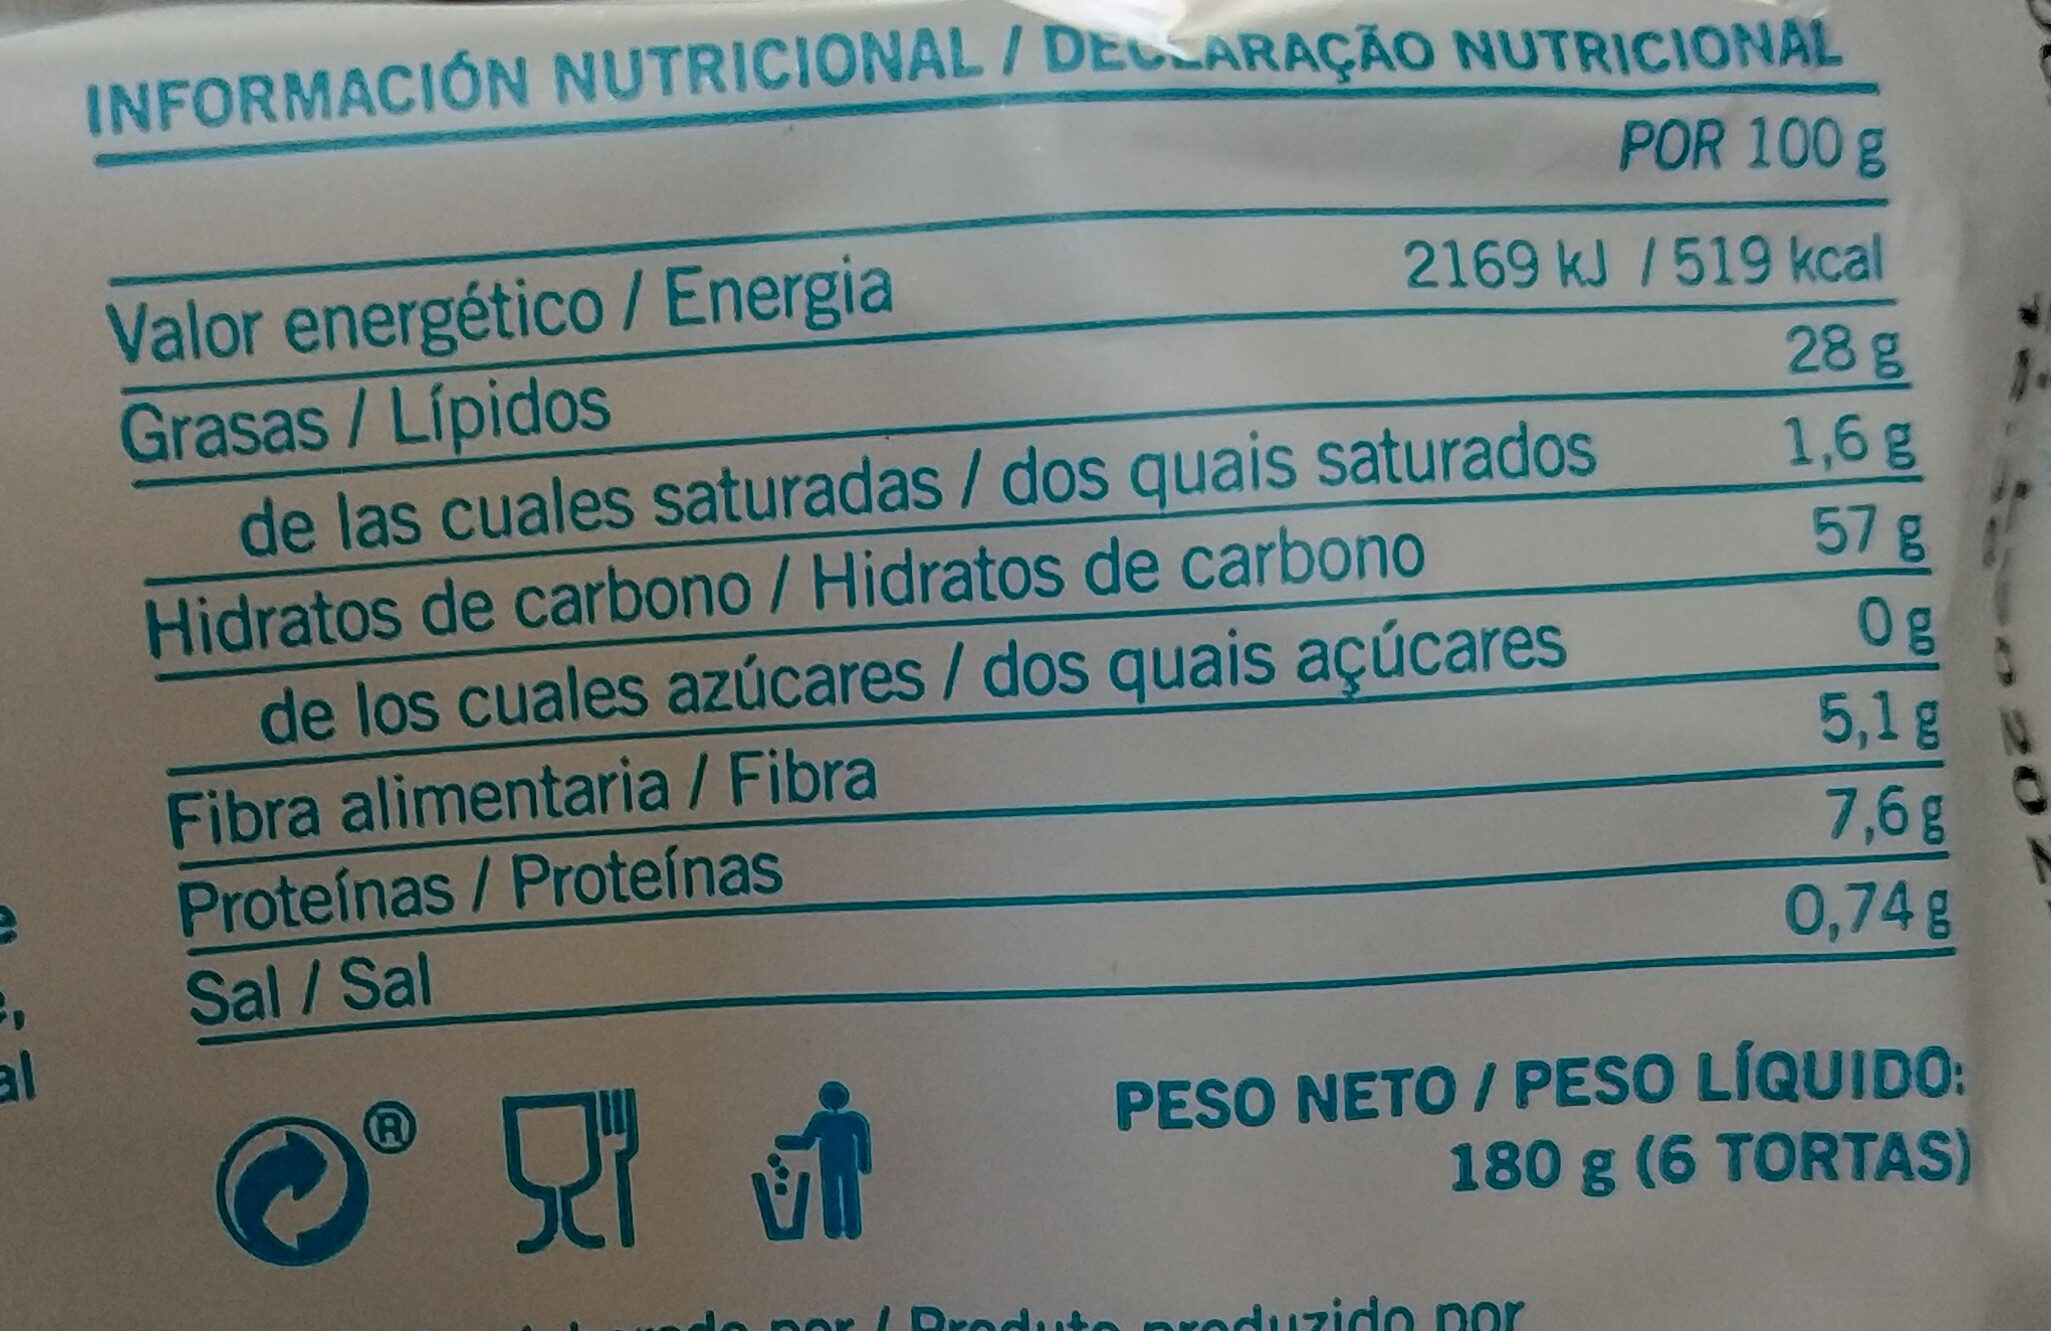 Tortas de aceite sin azucar - Informação nutricional - es